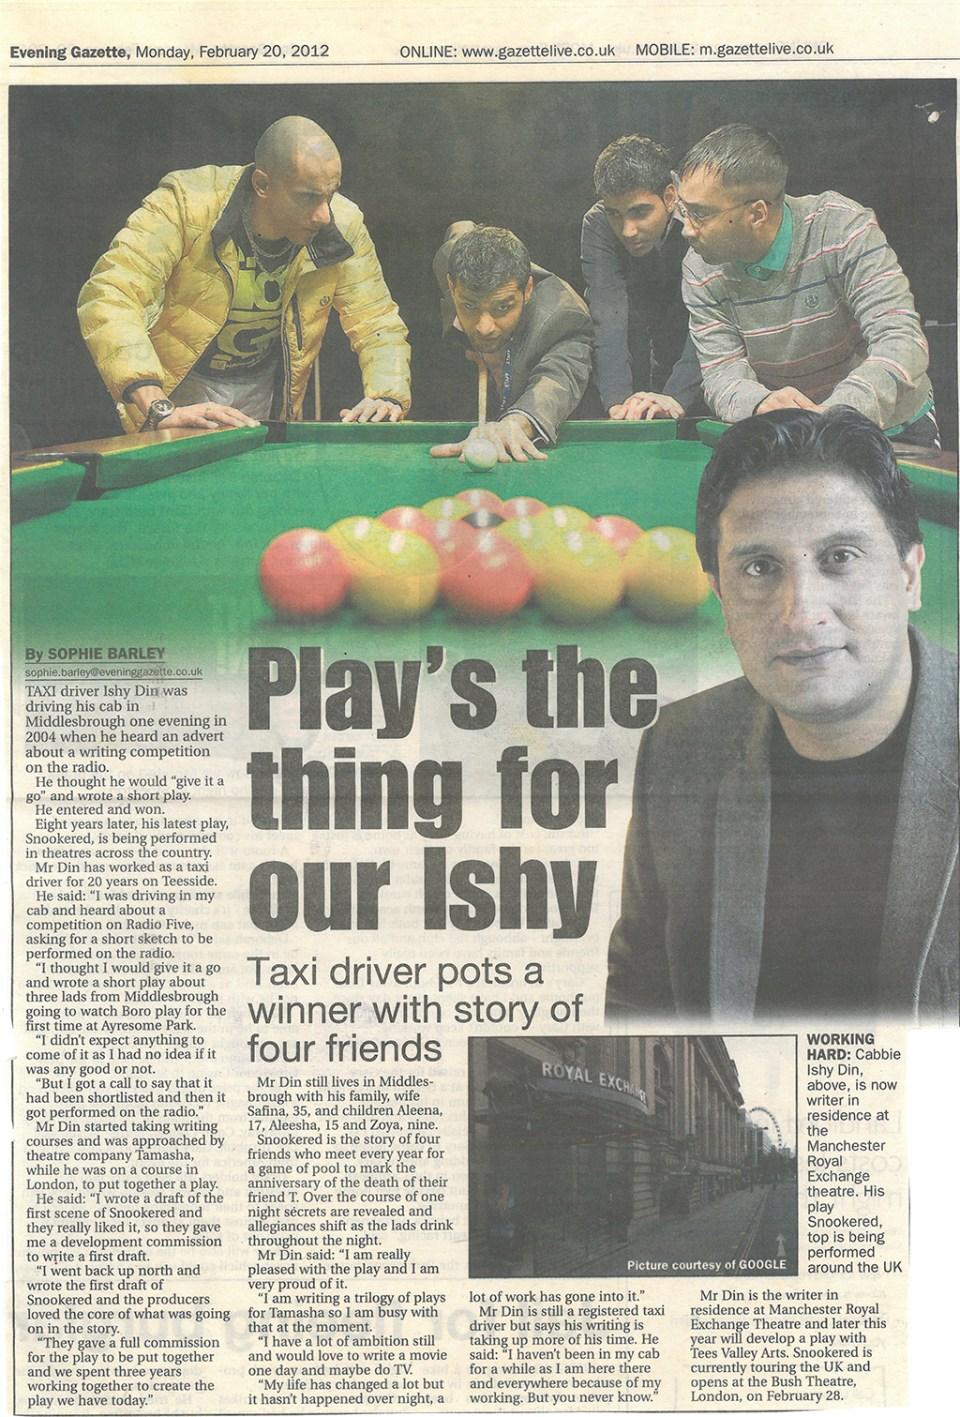 2012-02-20, Evening Gazette